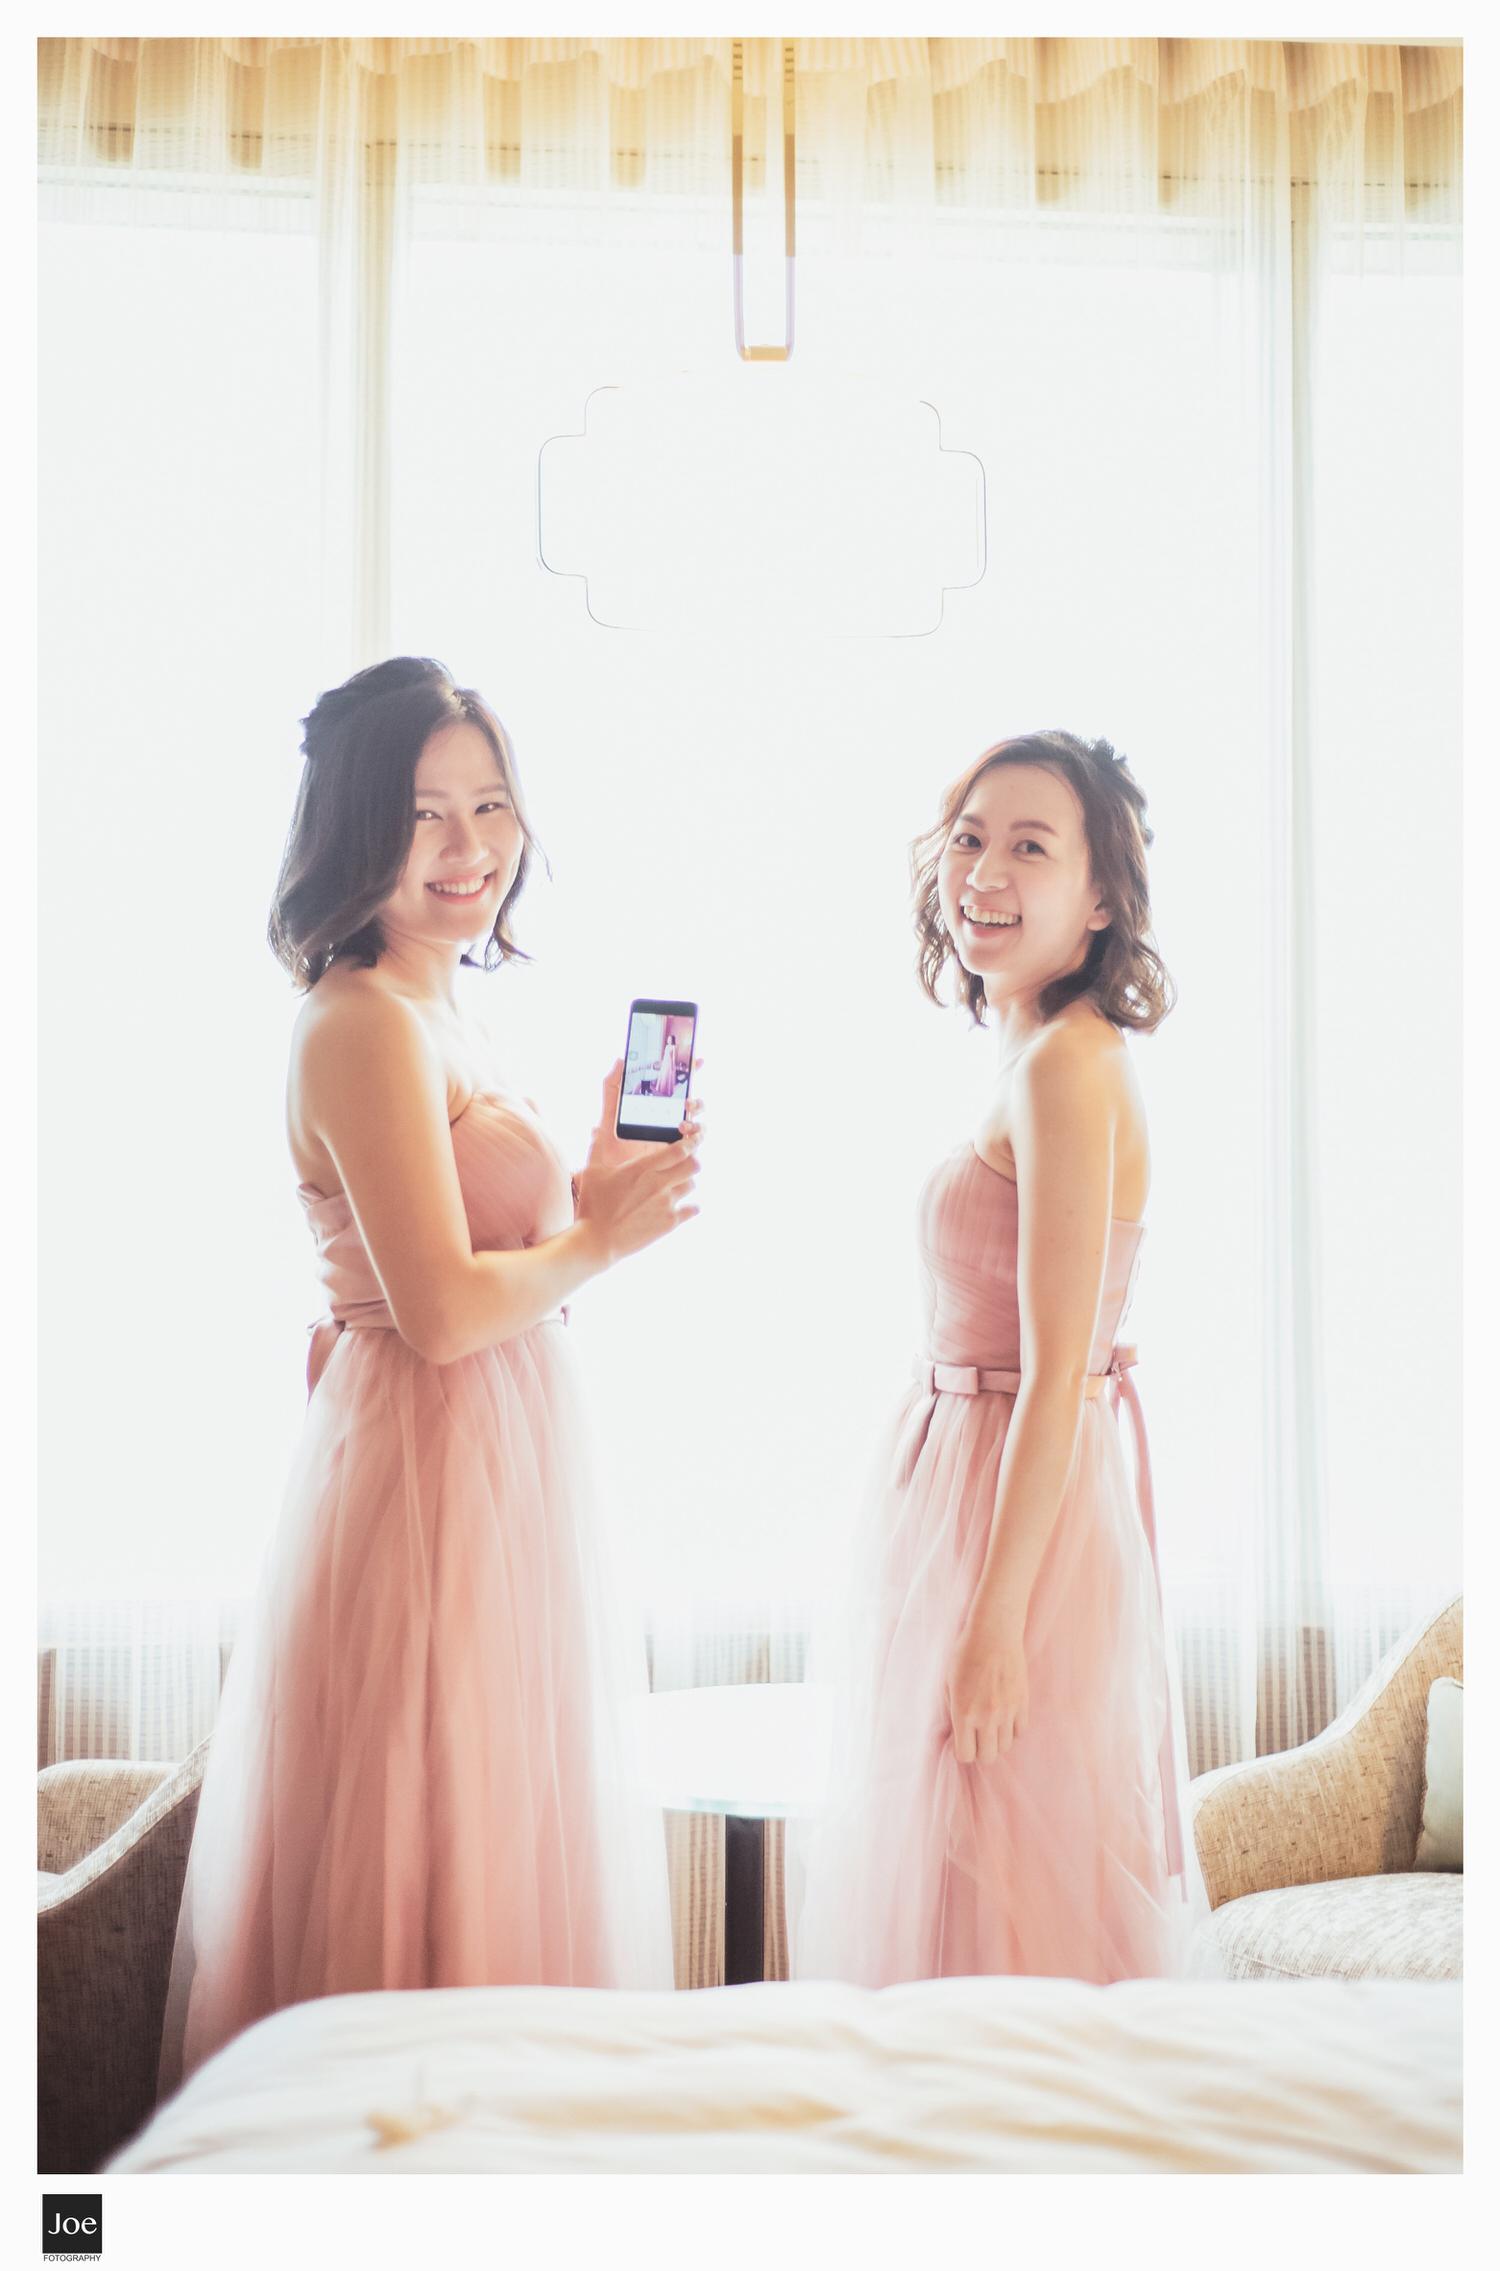 wedding-photography-shangri-la-far-eastern-plaza-hotel-ariel-sam-joe-fotography-004.jpg